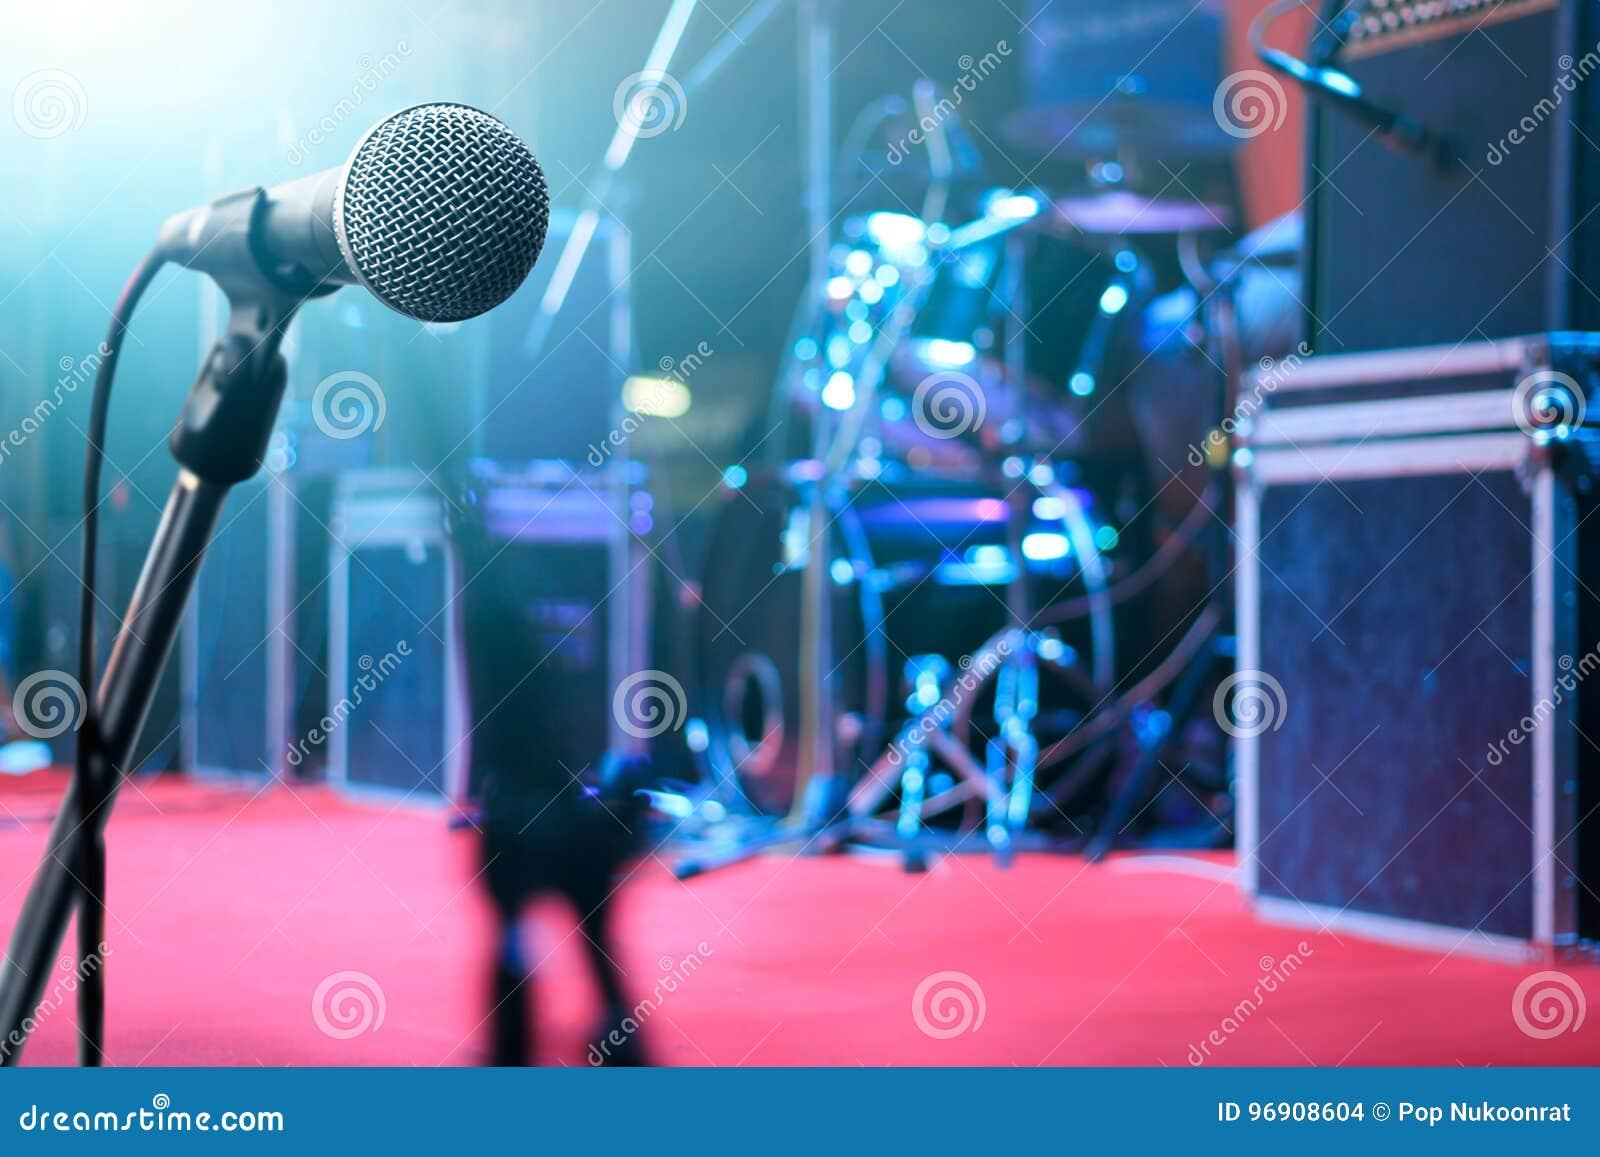 Microfone e instrumento de música no fundo de fase